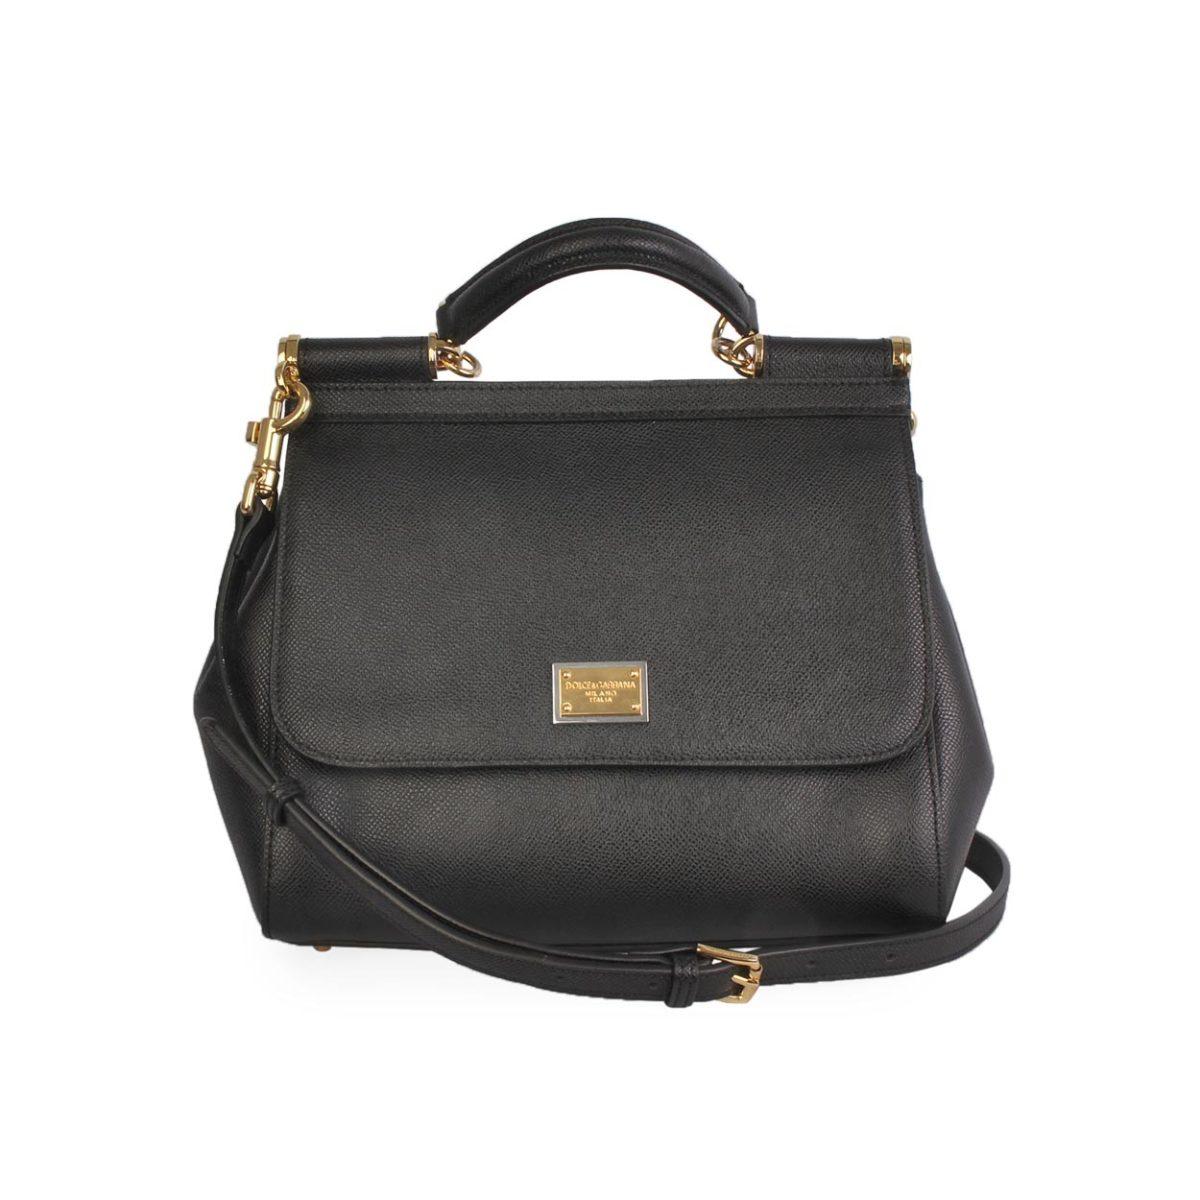 4b6f366ad2 DOLCE & GABBANA Dauphine Leather Sicily Medium Bag Black | Luxity